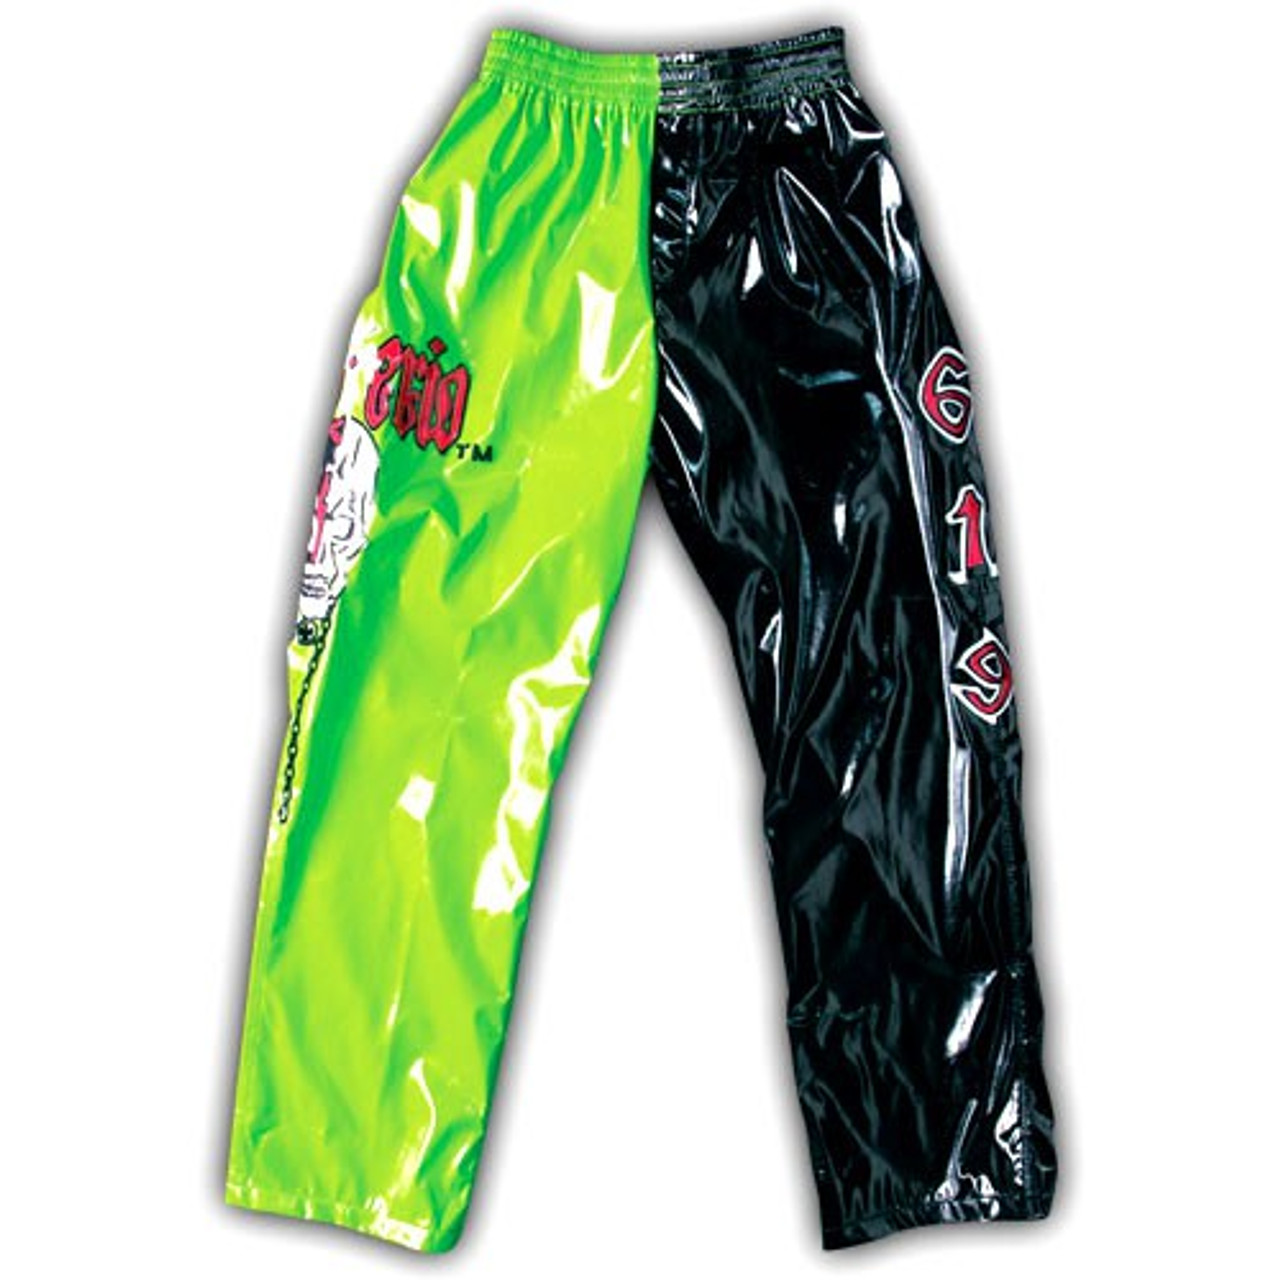 WWE Wrestling WCW Rey Mysterio Replica Pants [Green & Black]